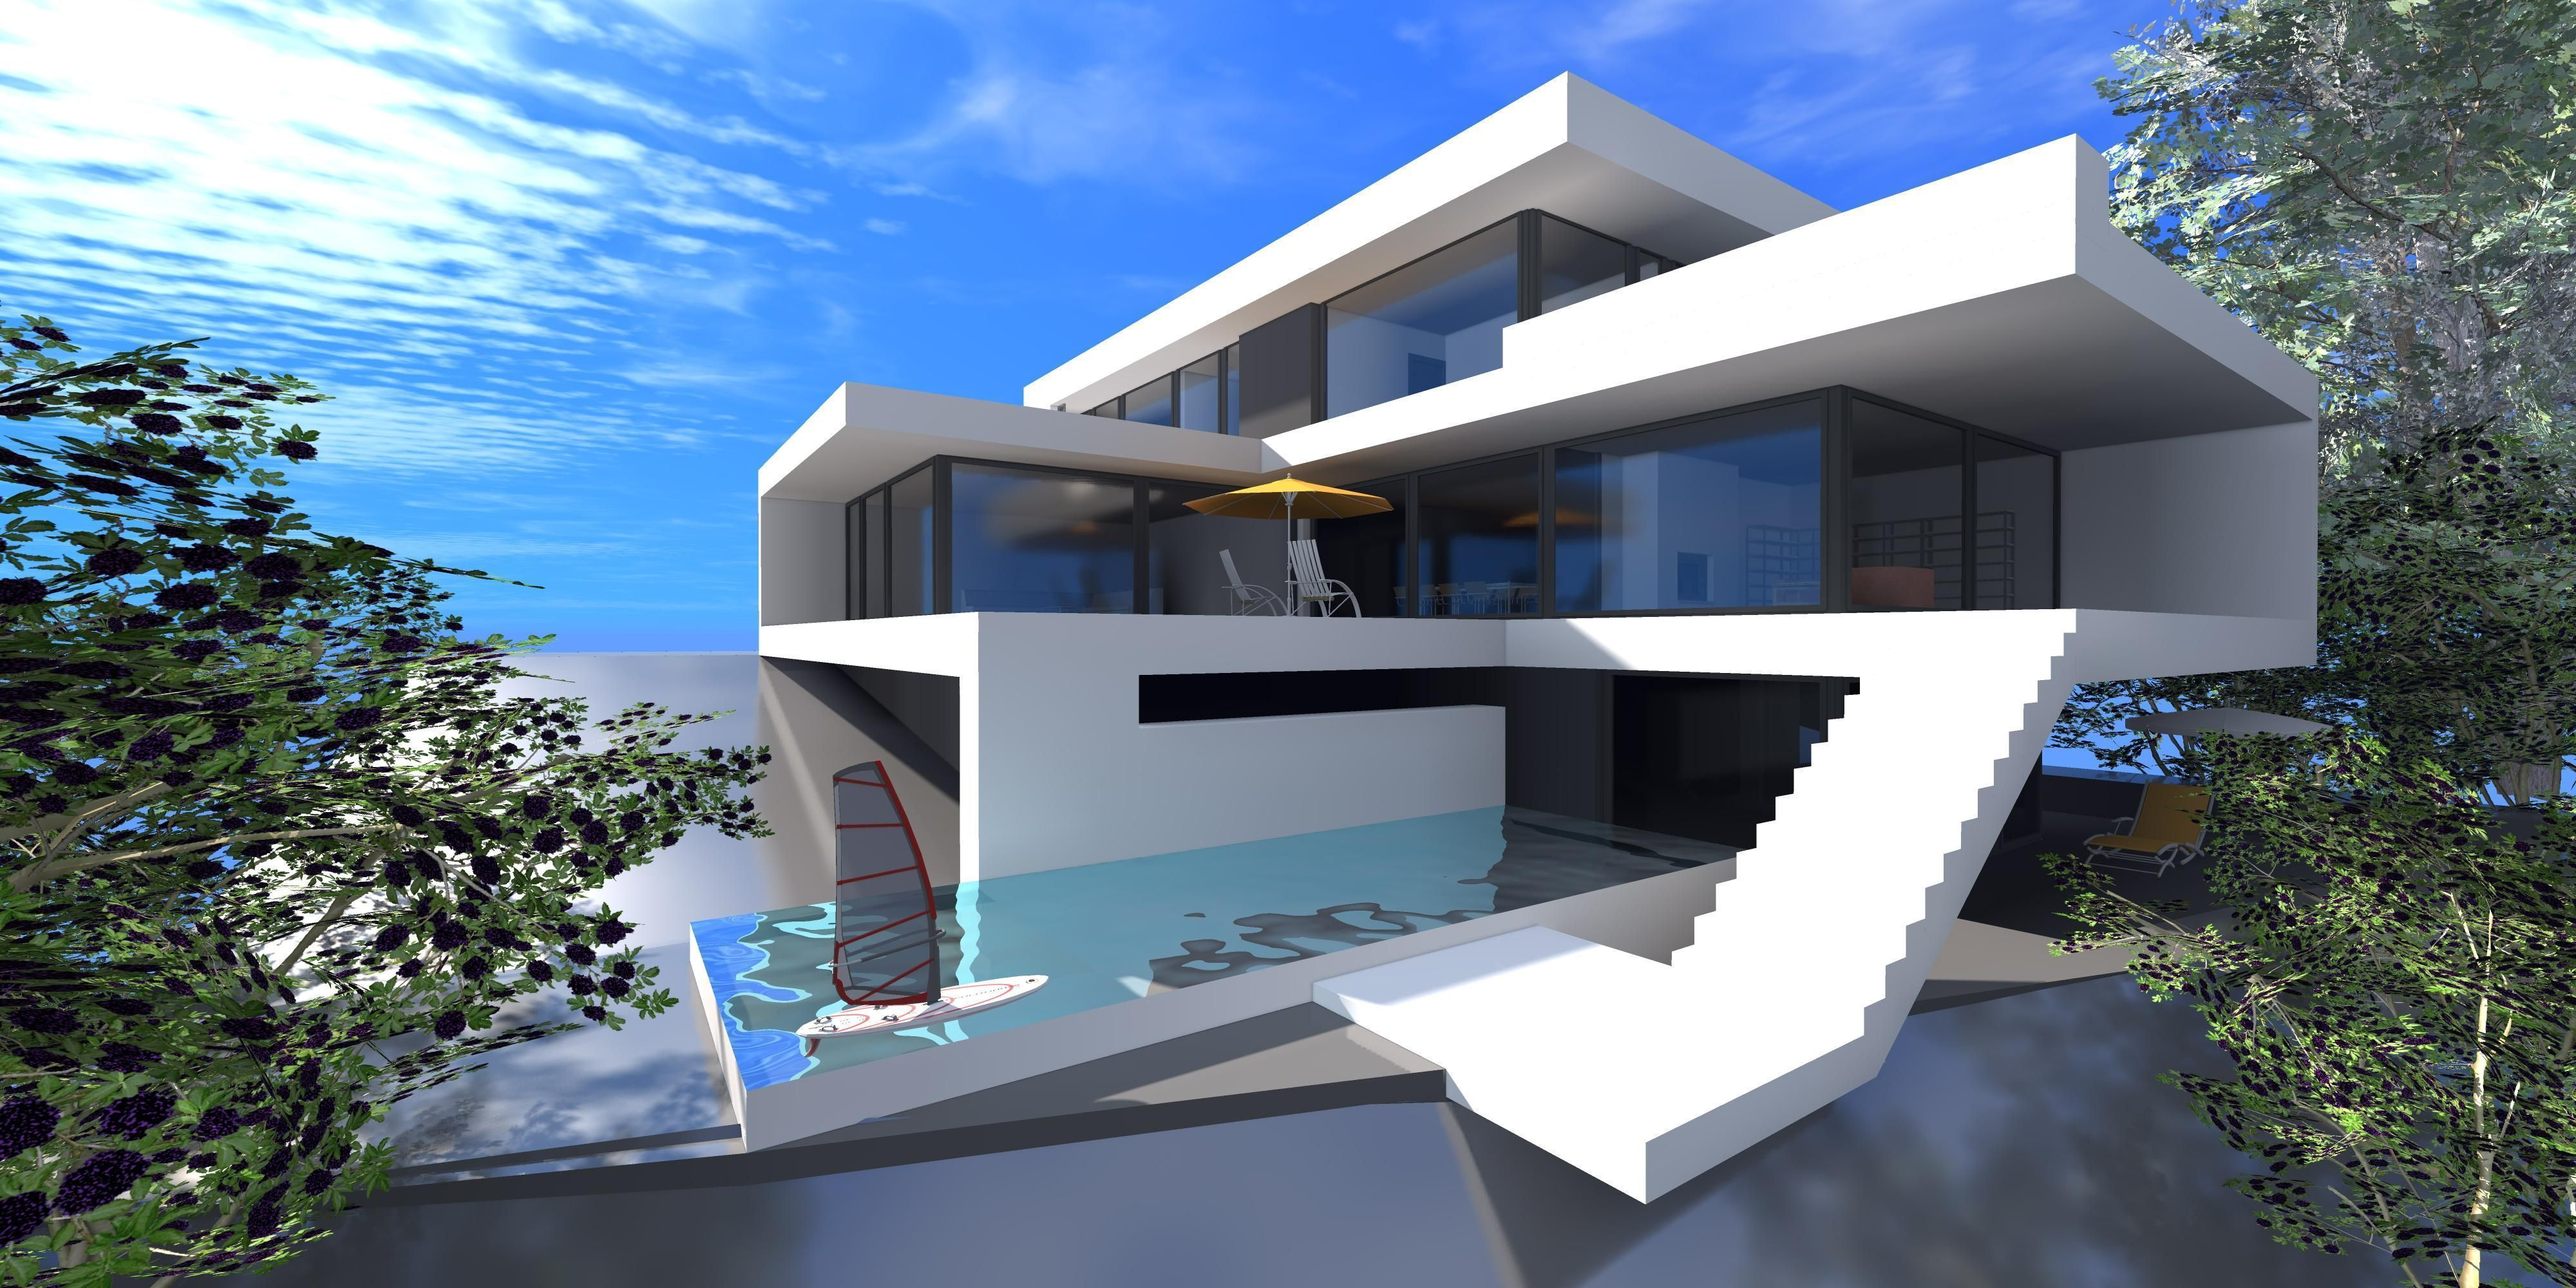 Modern building design concept modern residential building design modern house interior design photos modern house interior designs pictures